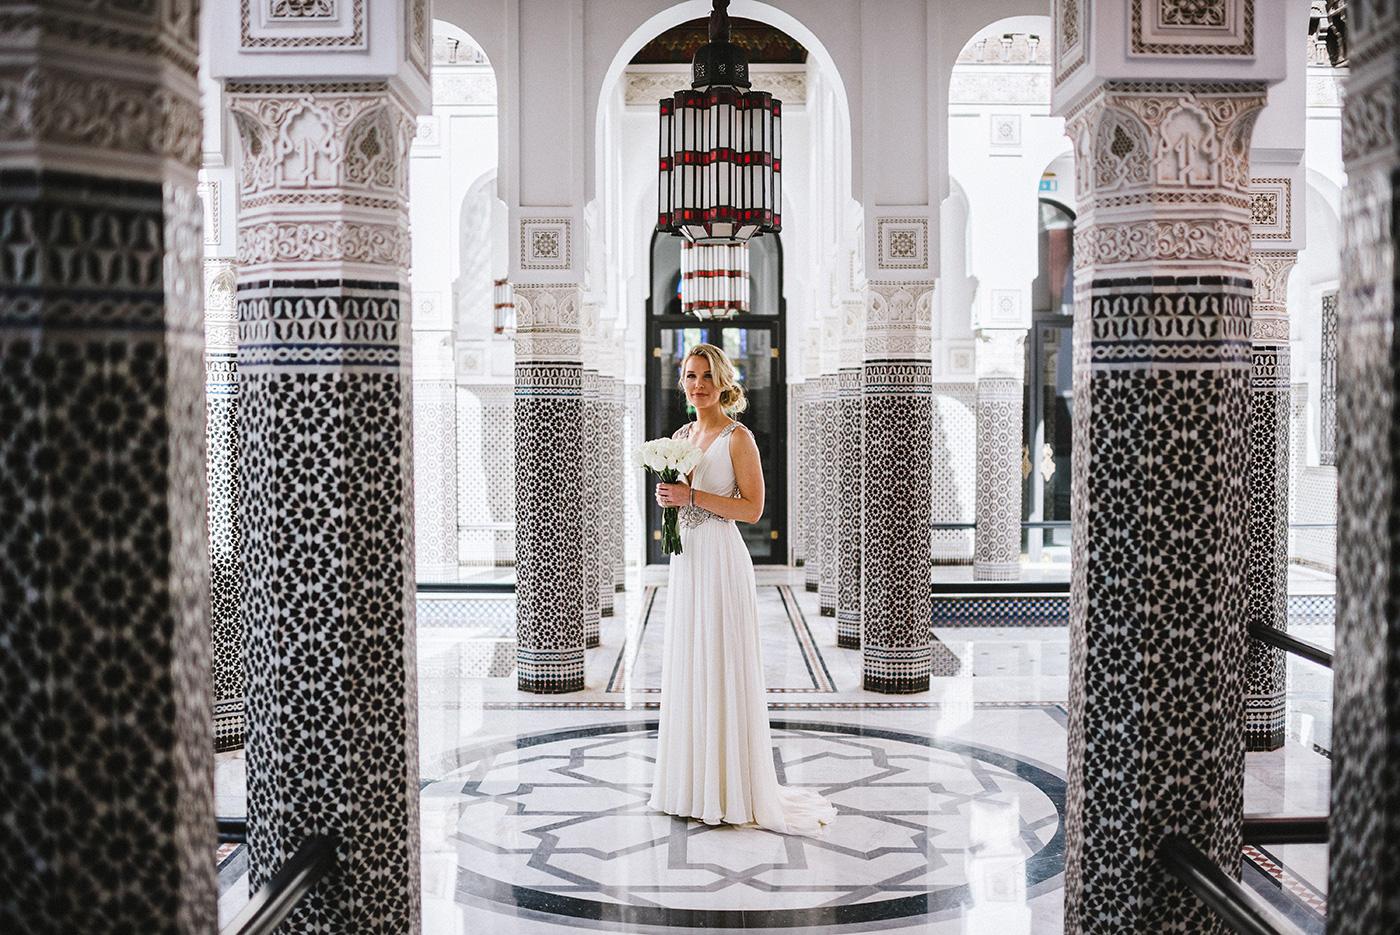 La Mamounia Marrakech Wedding 01 Boutique Souk